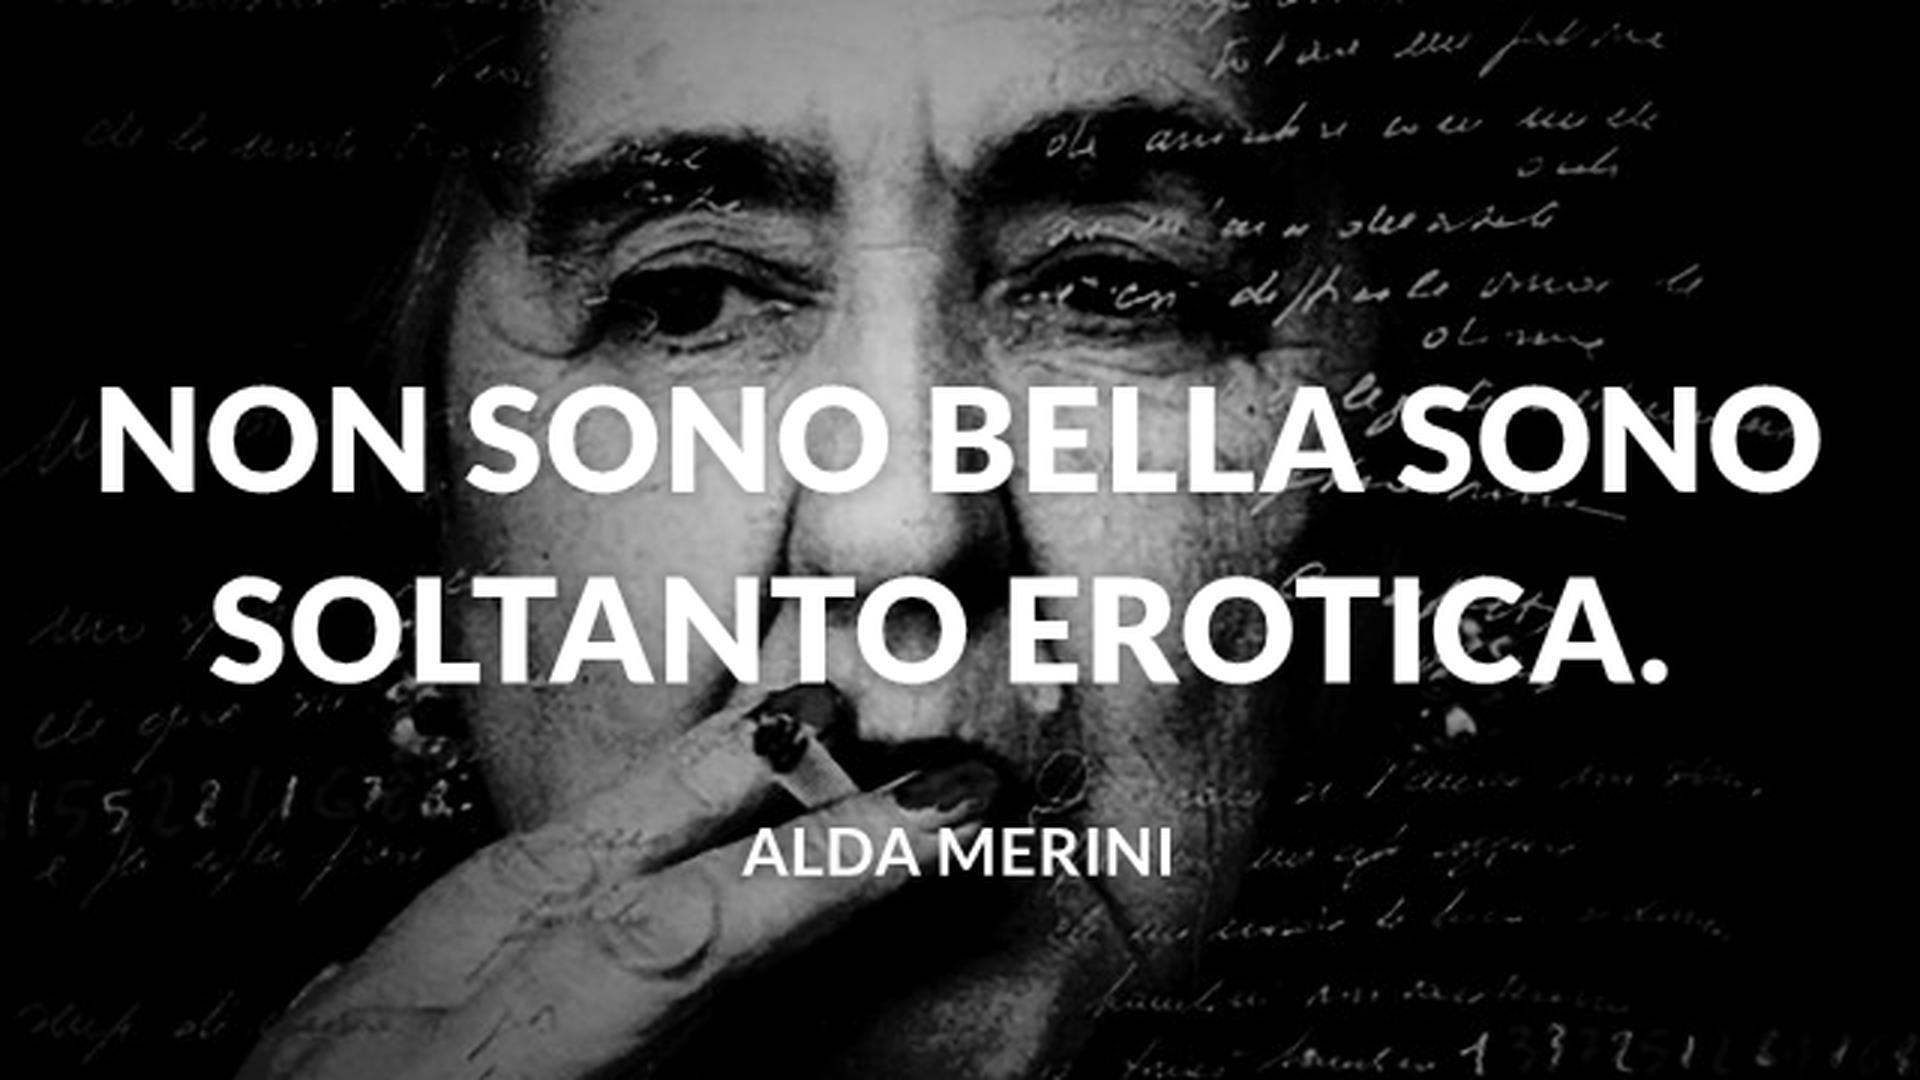 Frasi Sul Tempo Alda Merini.Alda Merini Frasi E Poesie Sulla Vita E L Anima